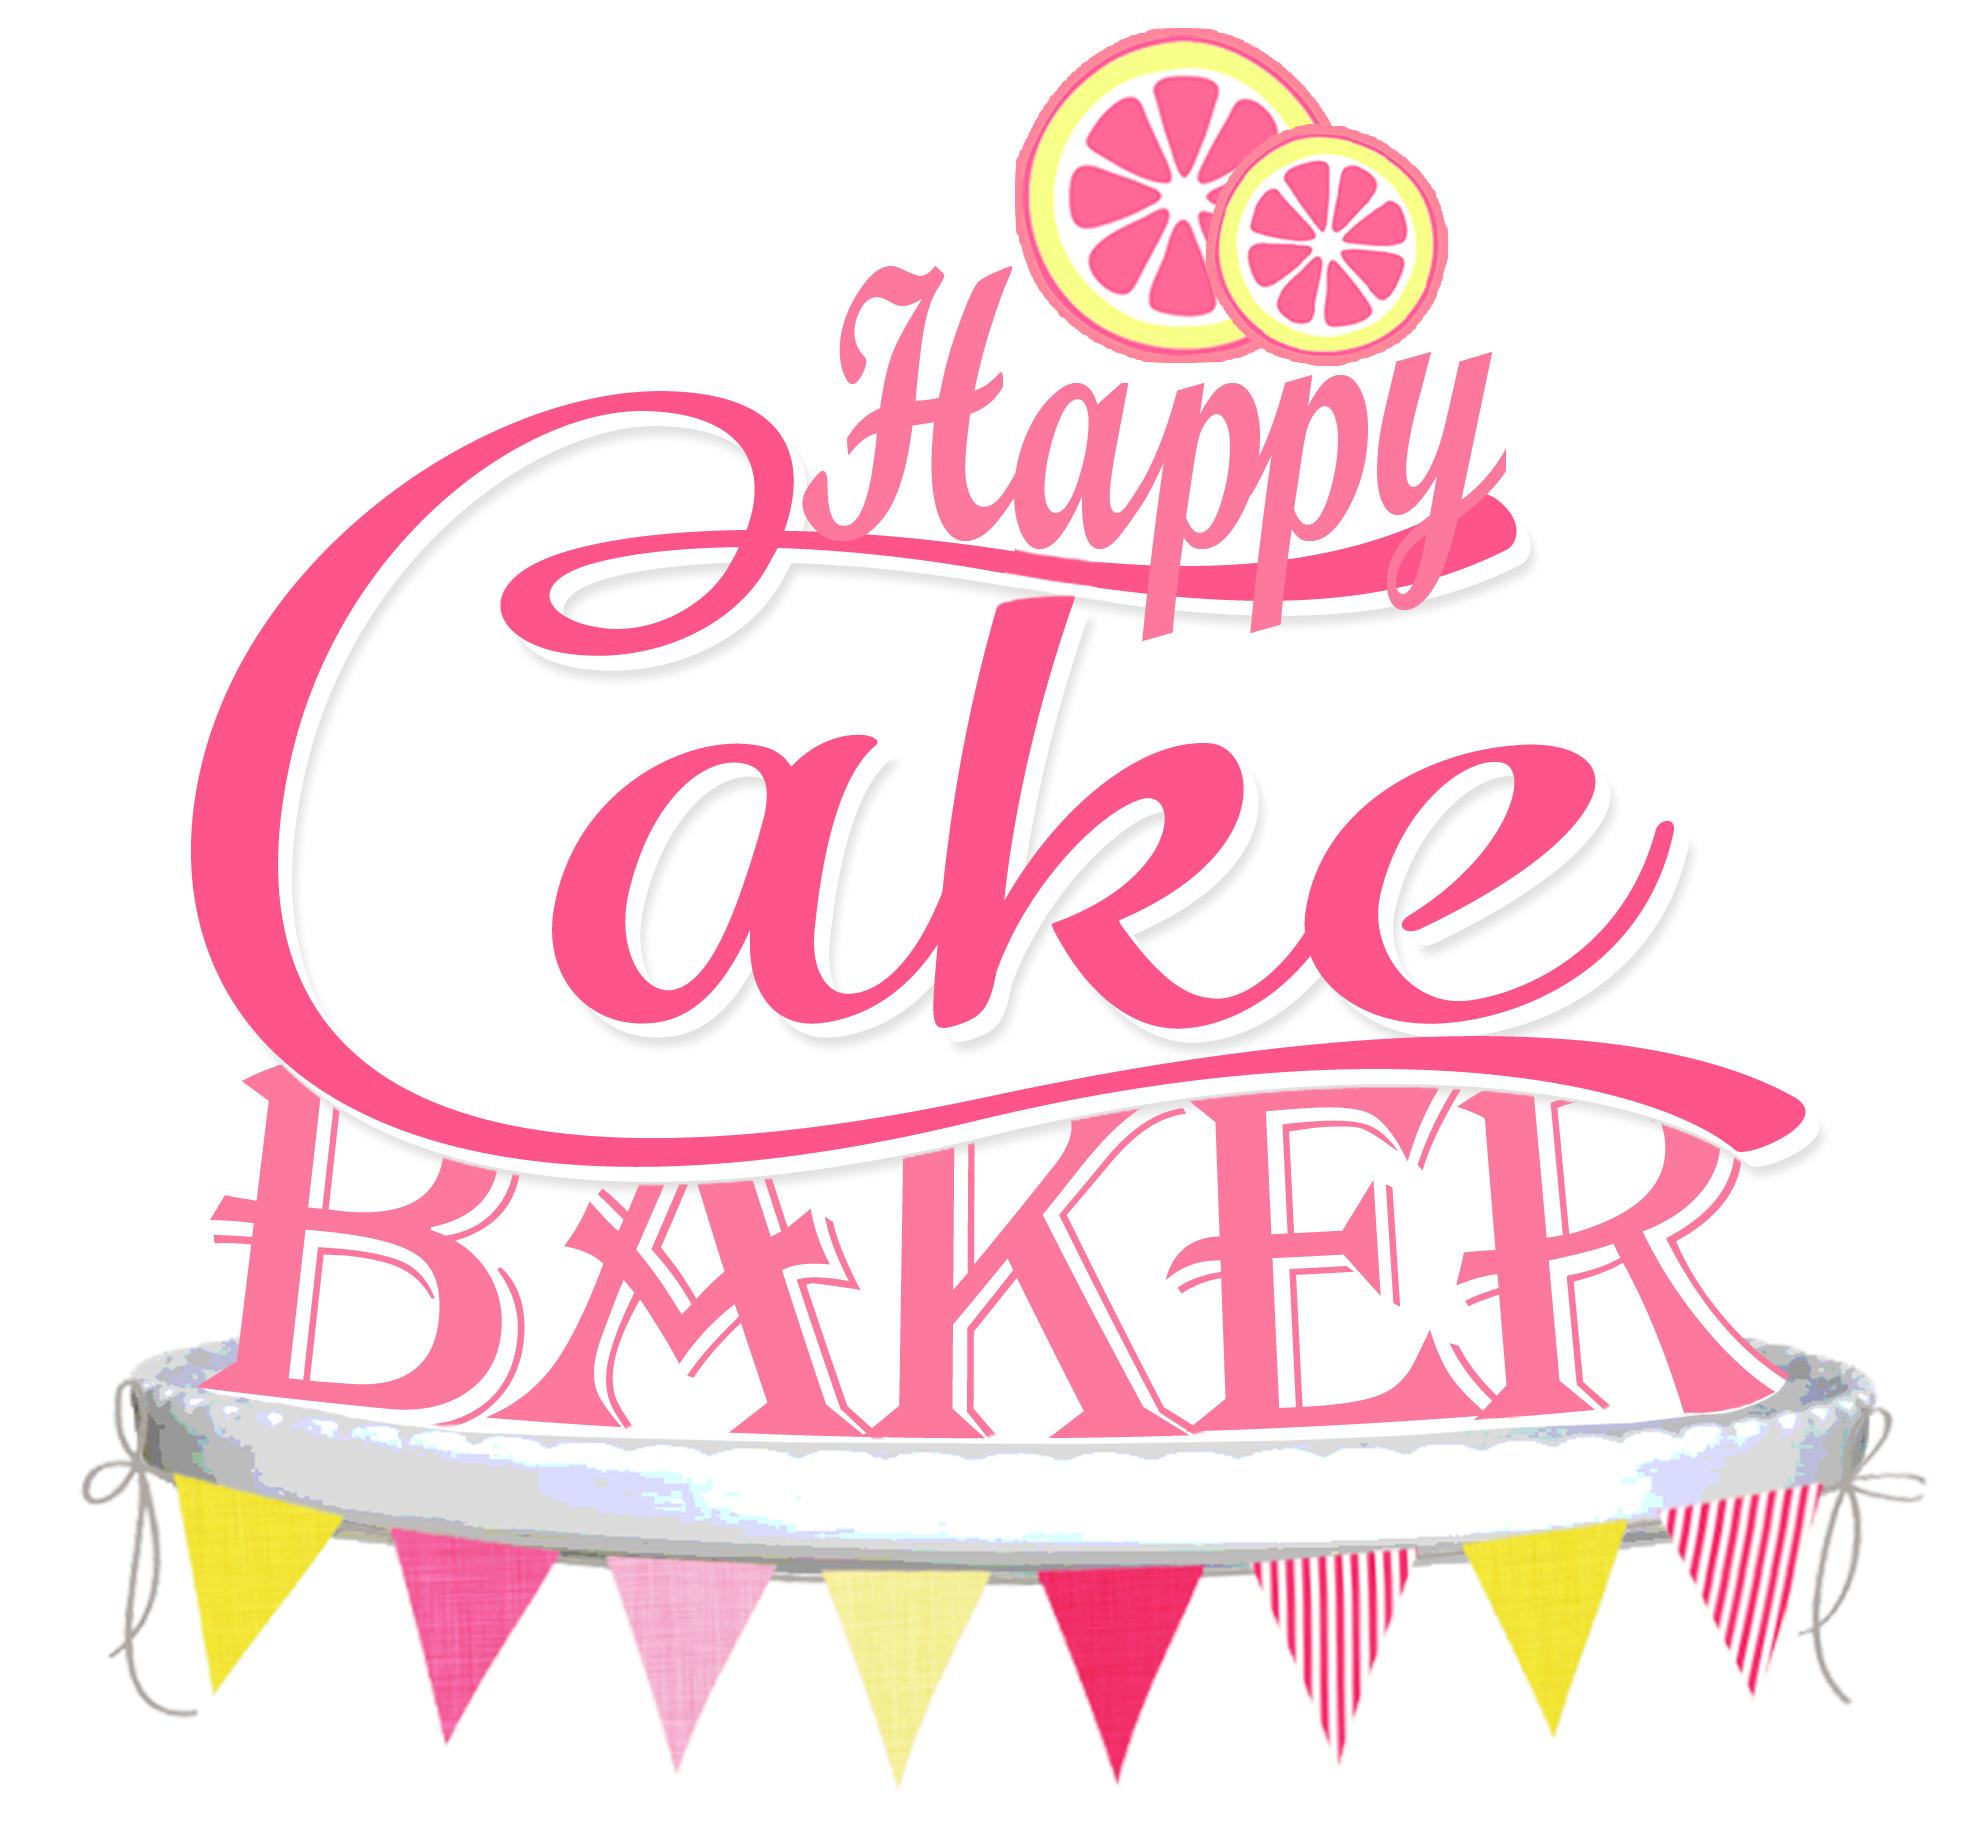 Logo_HappyCakeBaker_JPG